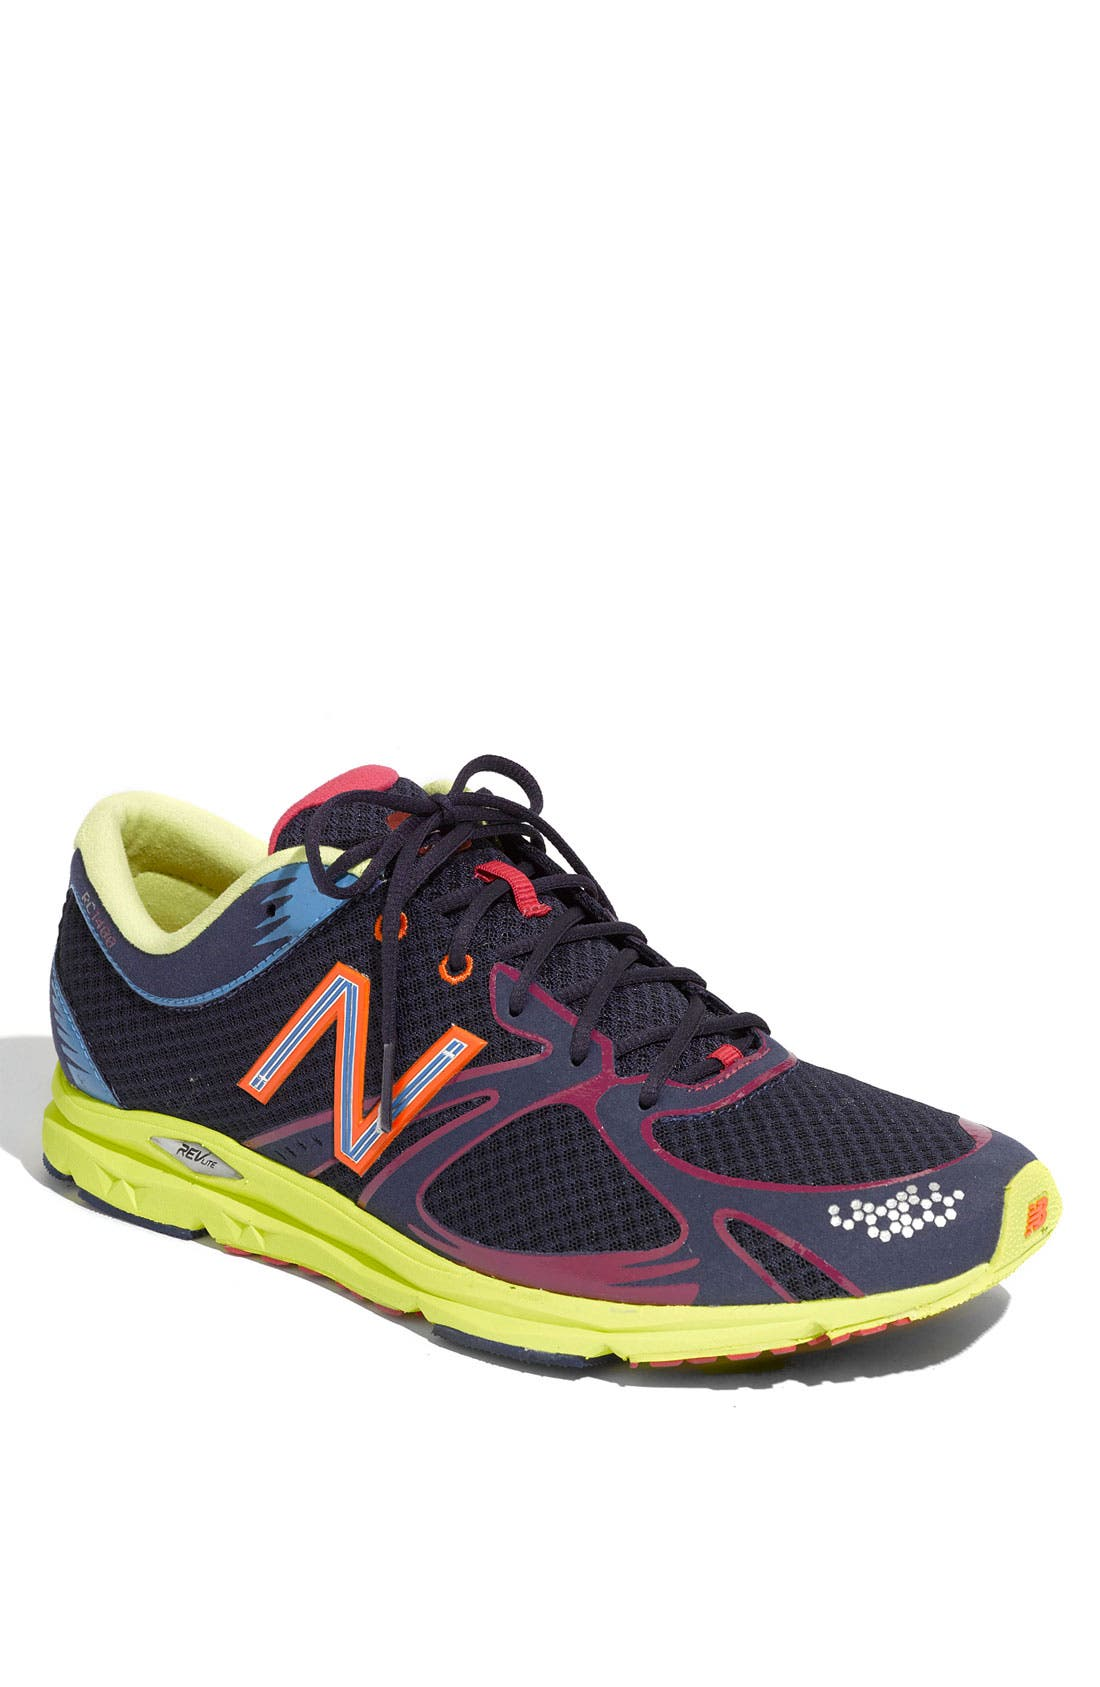 Alternate Image 1 Selected - New Balance '1400' Running Shoe (Men)